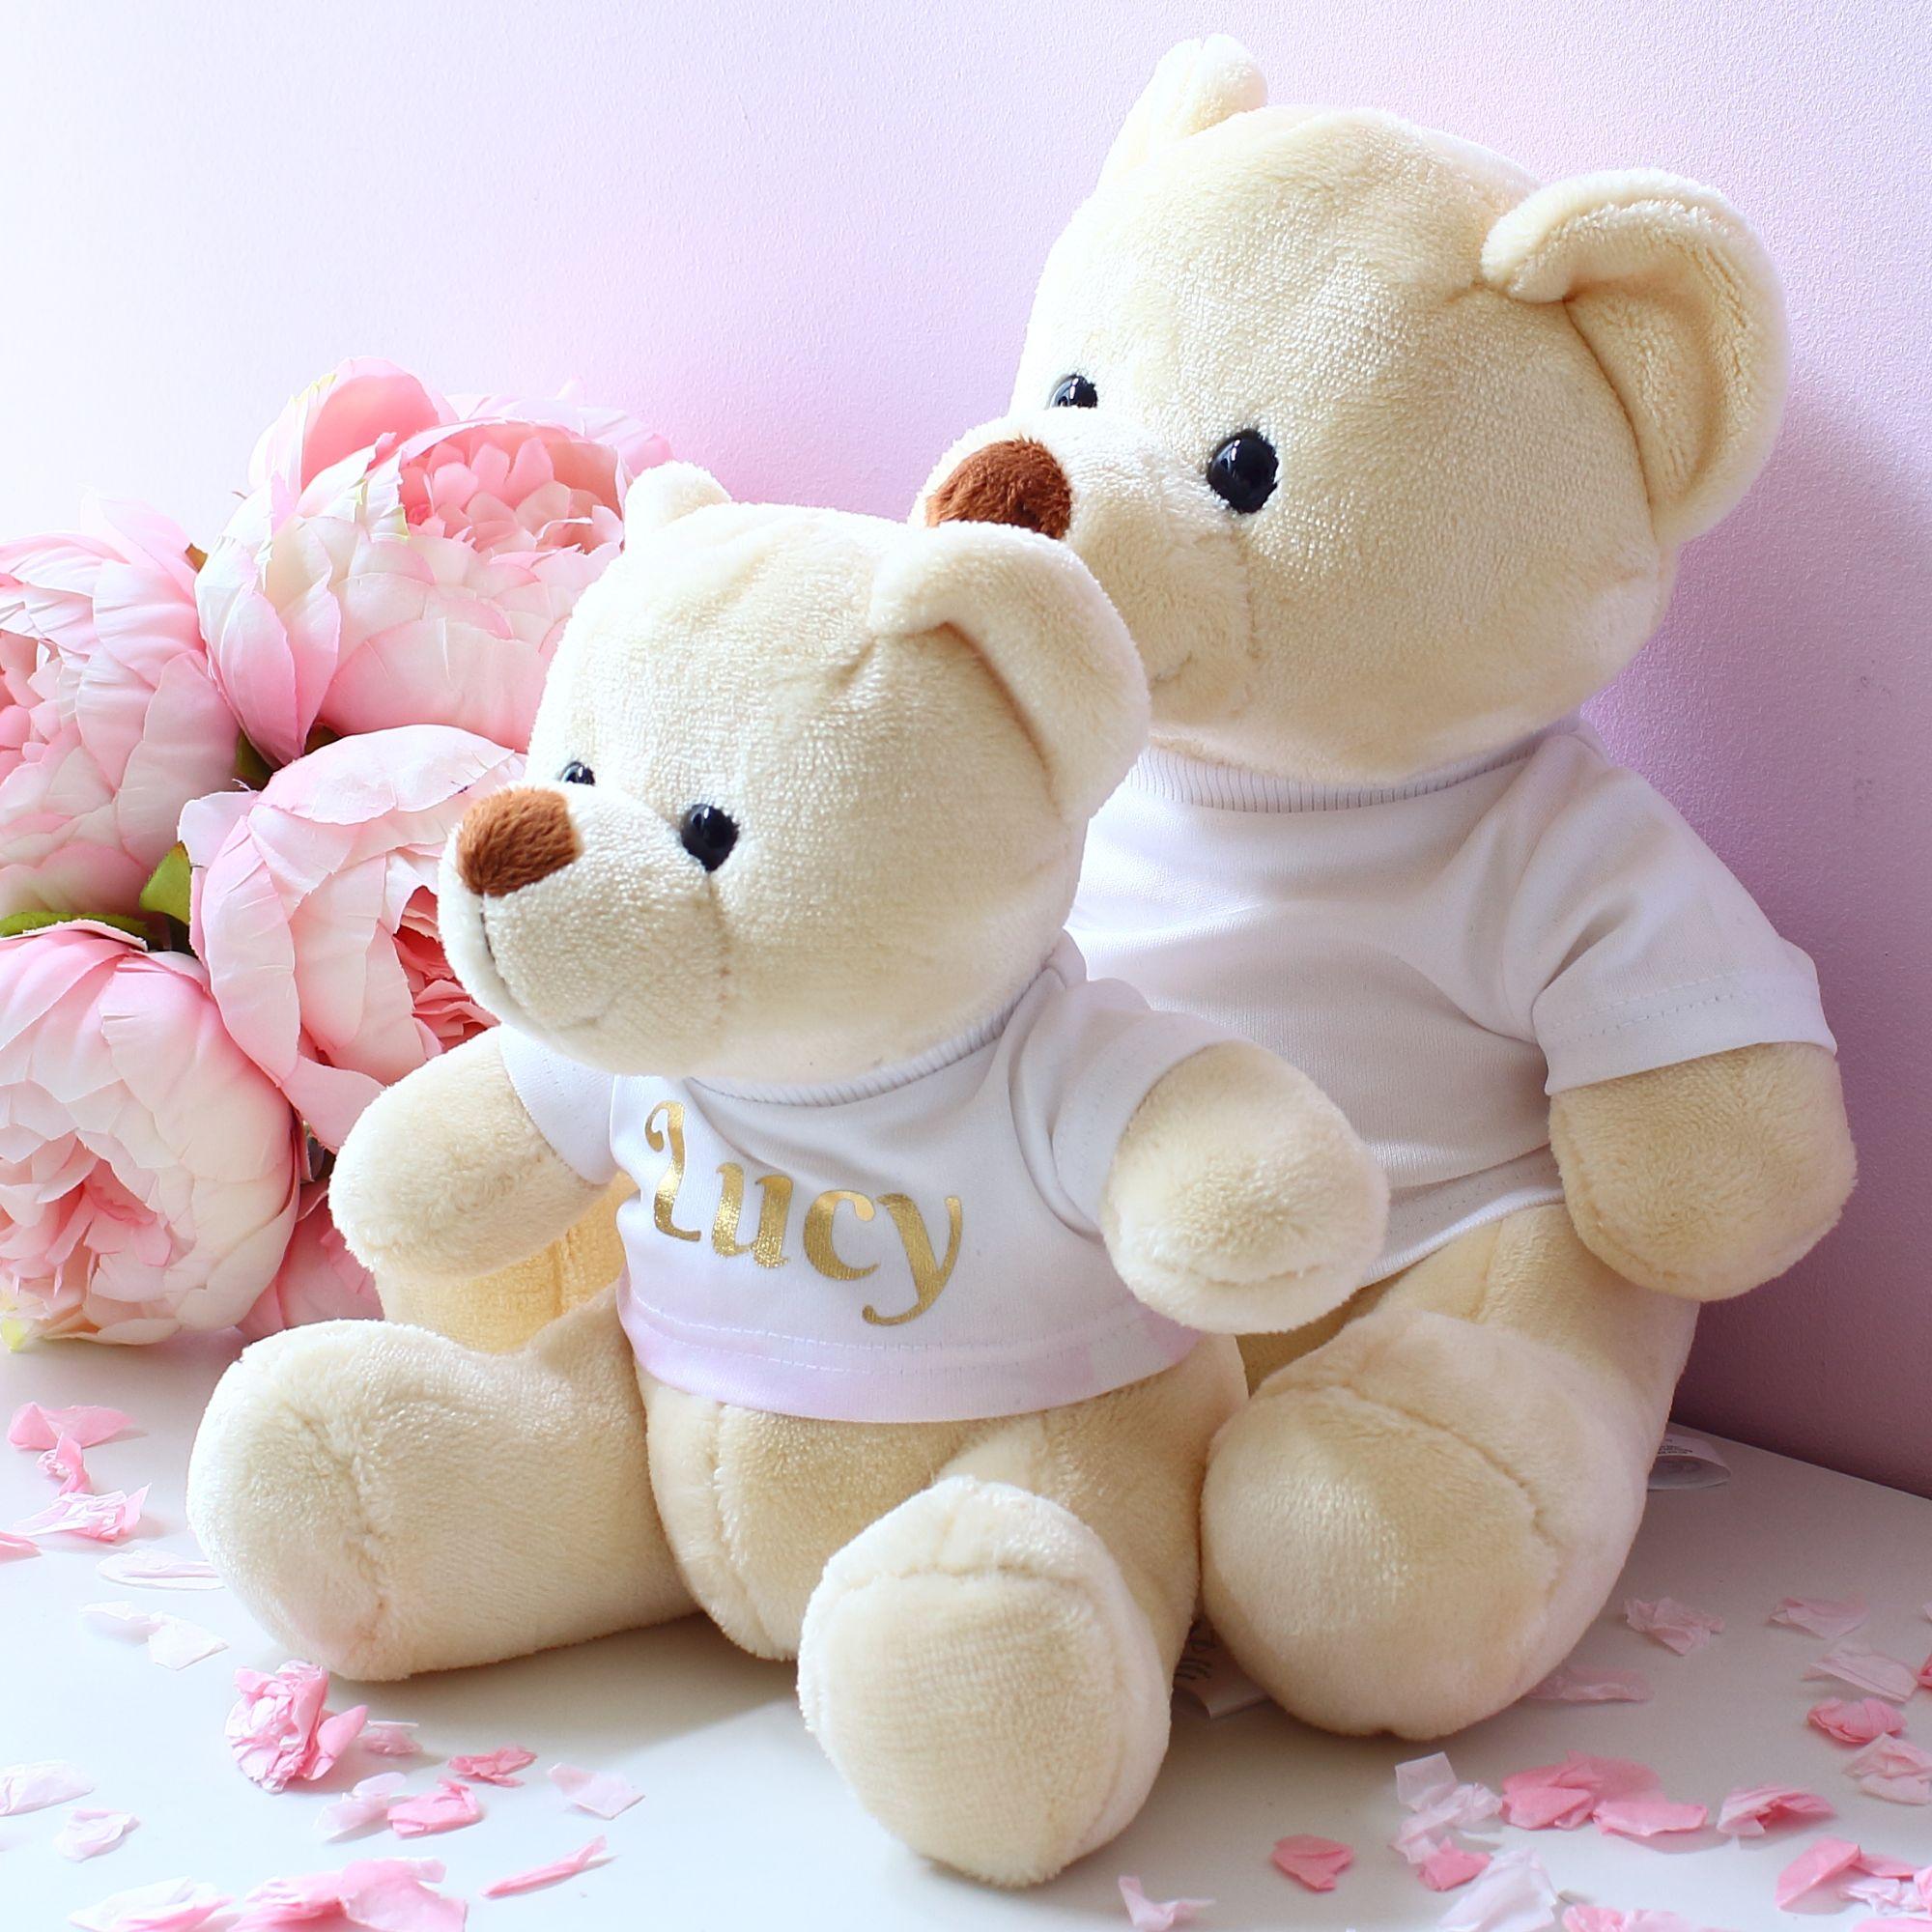 Personalised velvet teddy bears